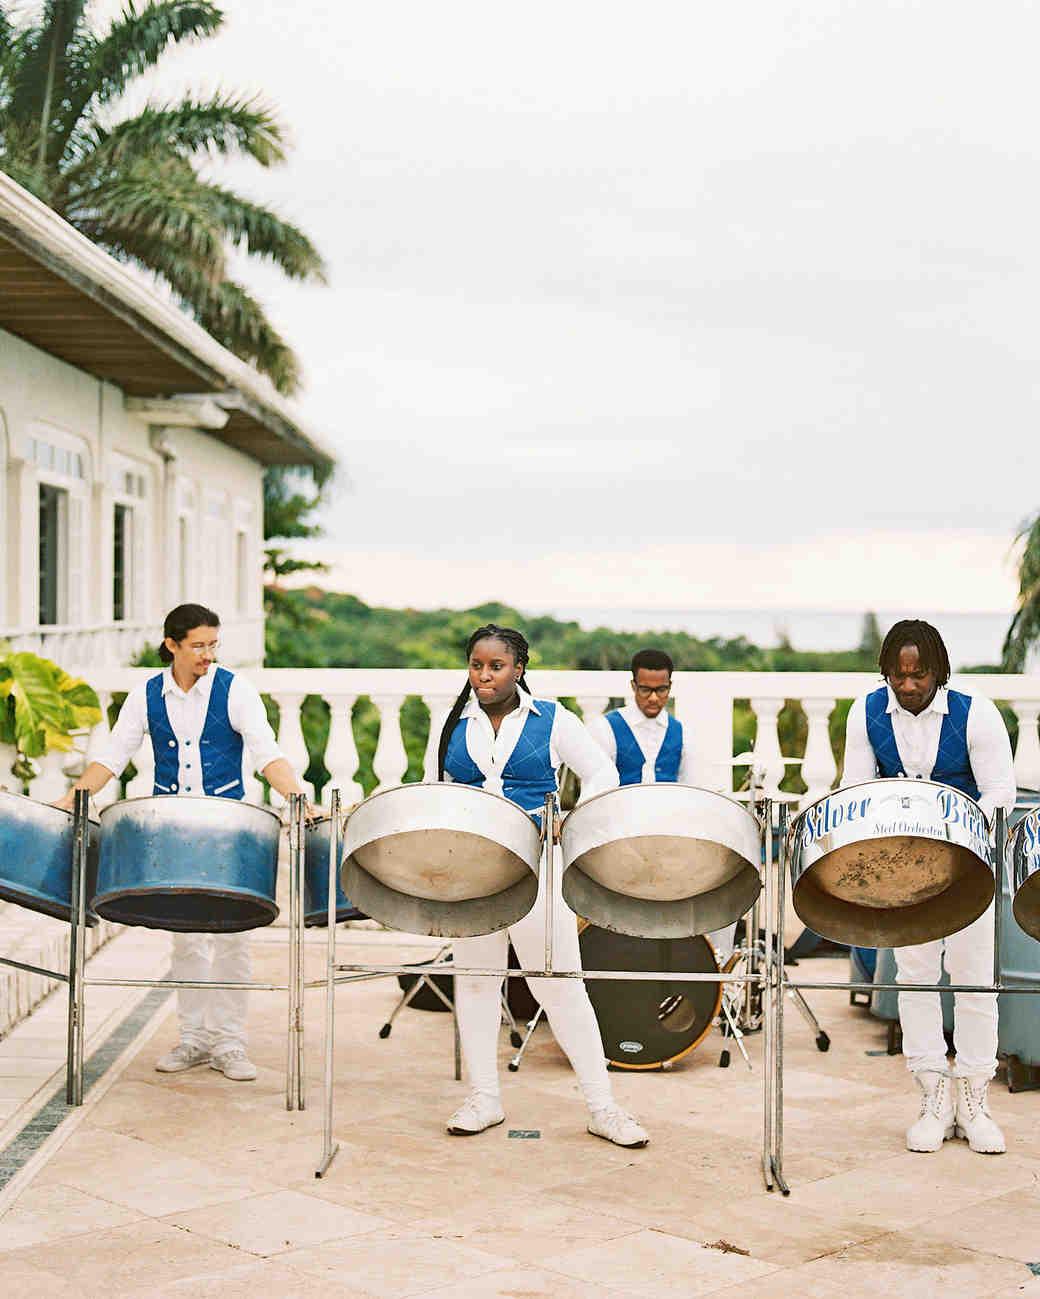 Amazing Jamaican Themed Wedding Image Collection - Wedding Idea 2018 ...